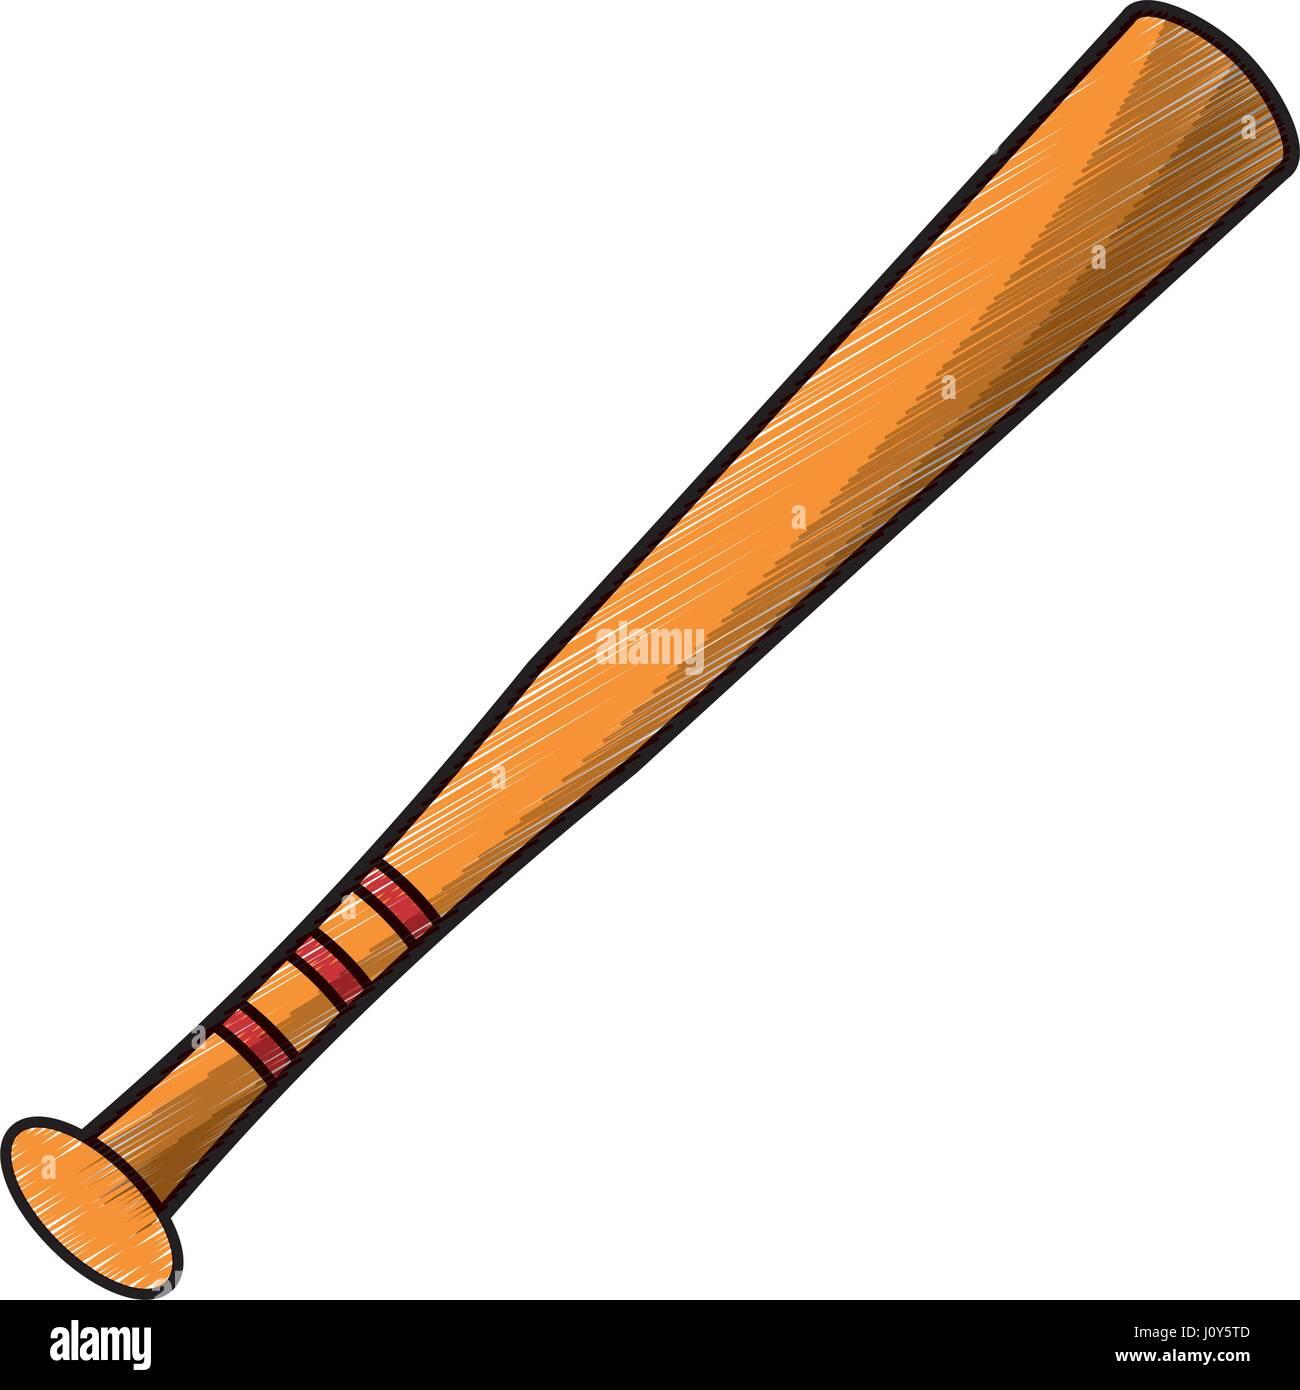 drawing bat baseball equipment stock vector art illustration rh alamy com baseball bat vector free baseball bat vector logo